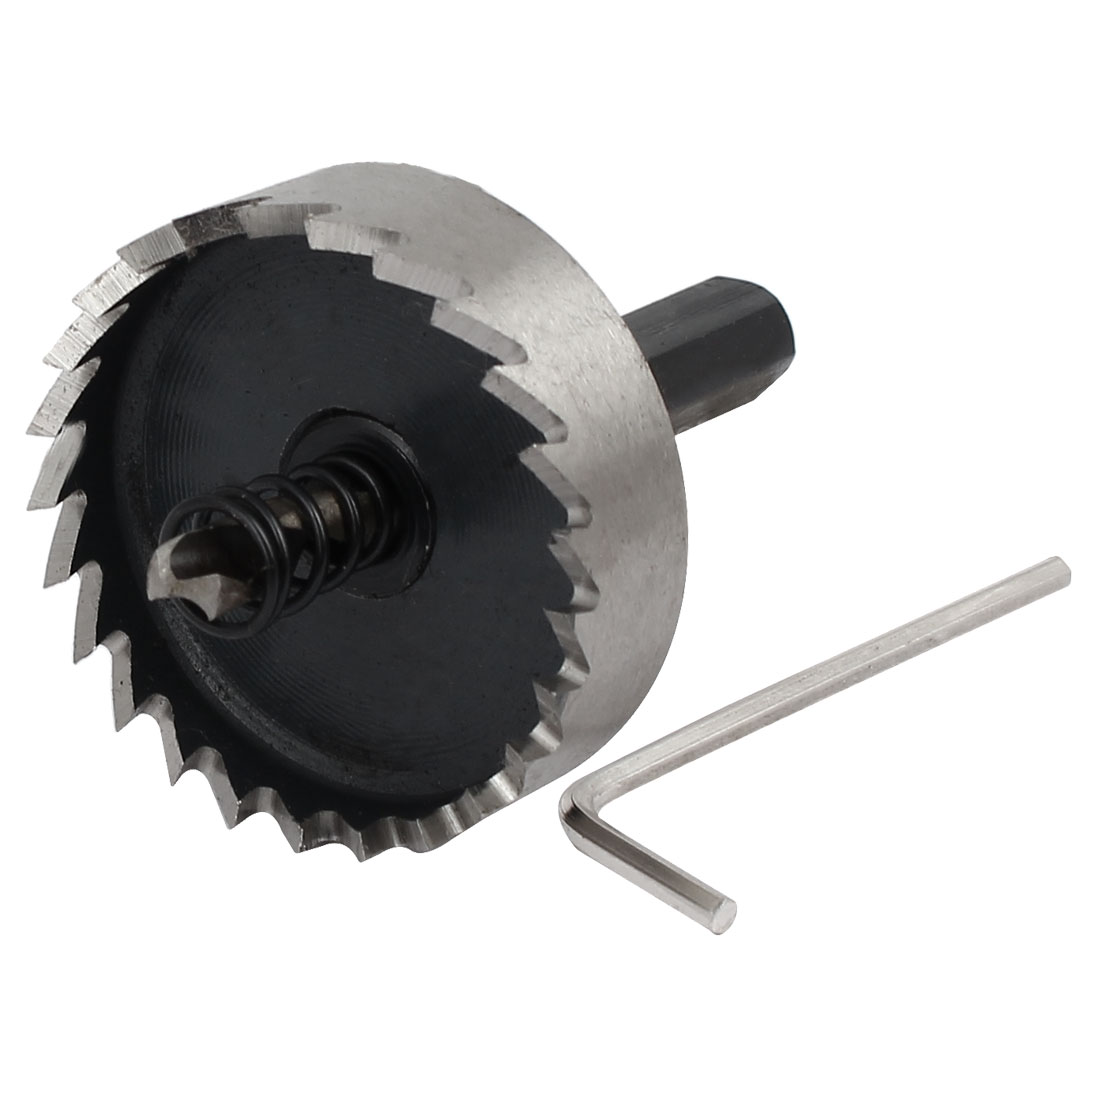 45mm Cutting Dia 69mm Long HSS Spring Loaded Twist Drill Bit Hole Saw Cutter